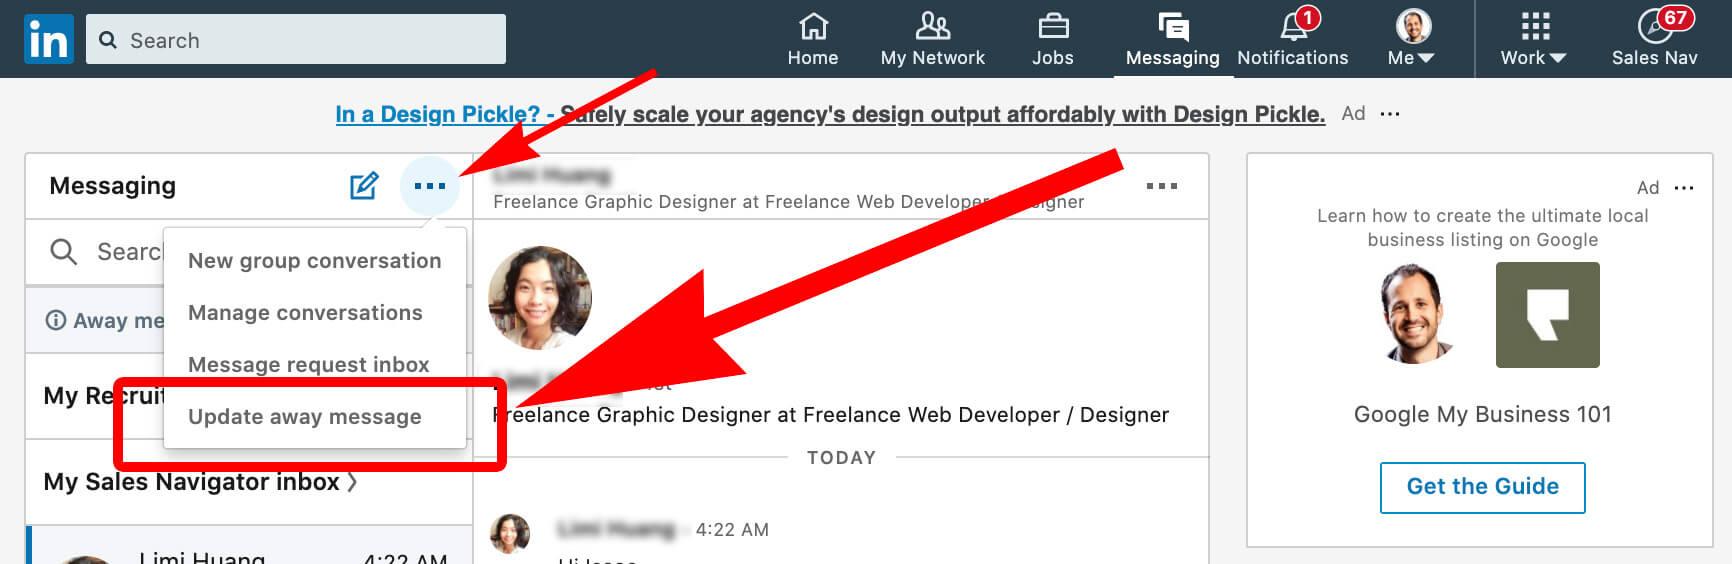 Linkedin how to set away message on desktop 1 - select drop down